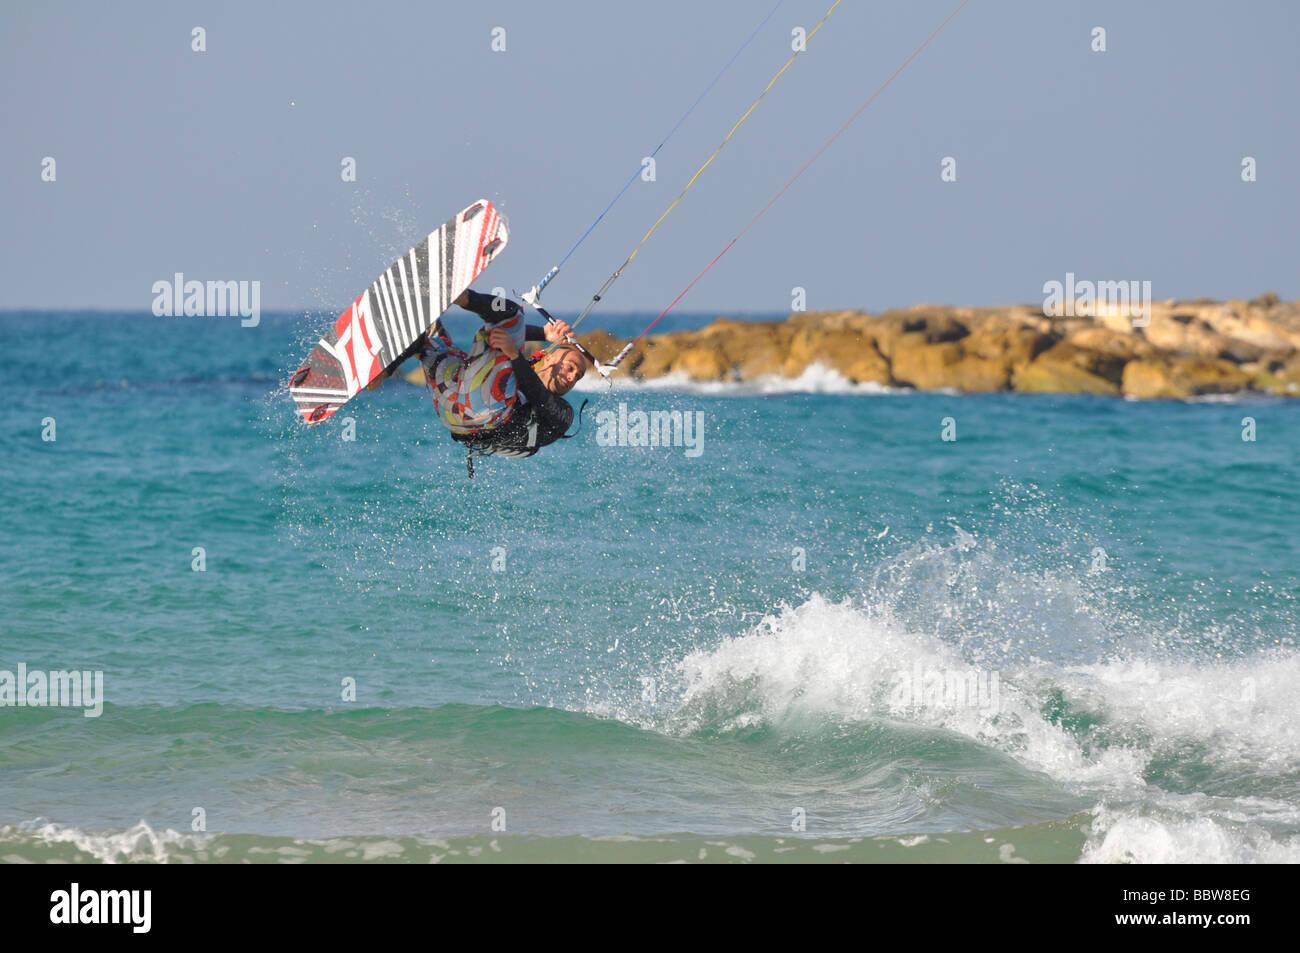 Israel Tel Aviv Kite surfing in the Mediterranean sea - Stock Image